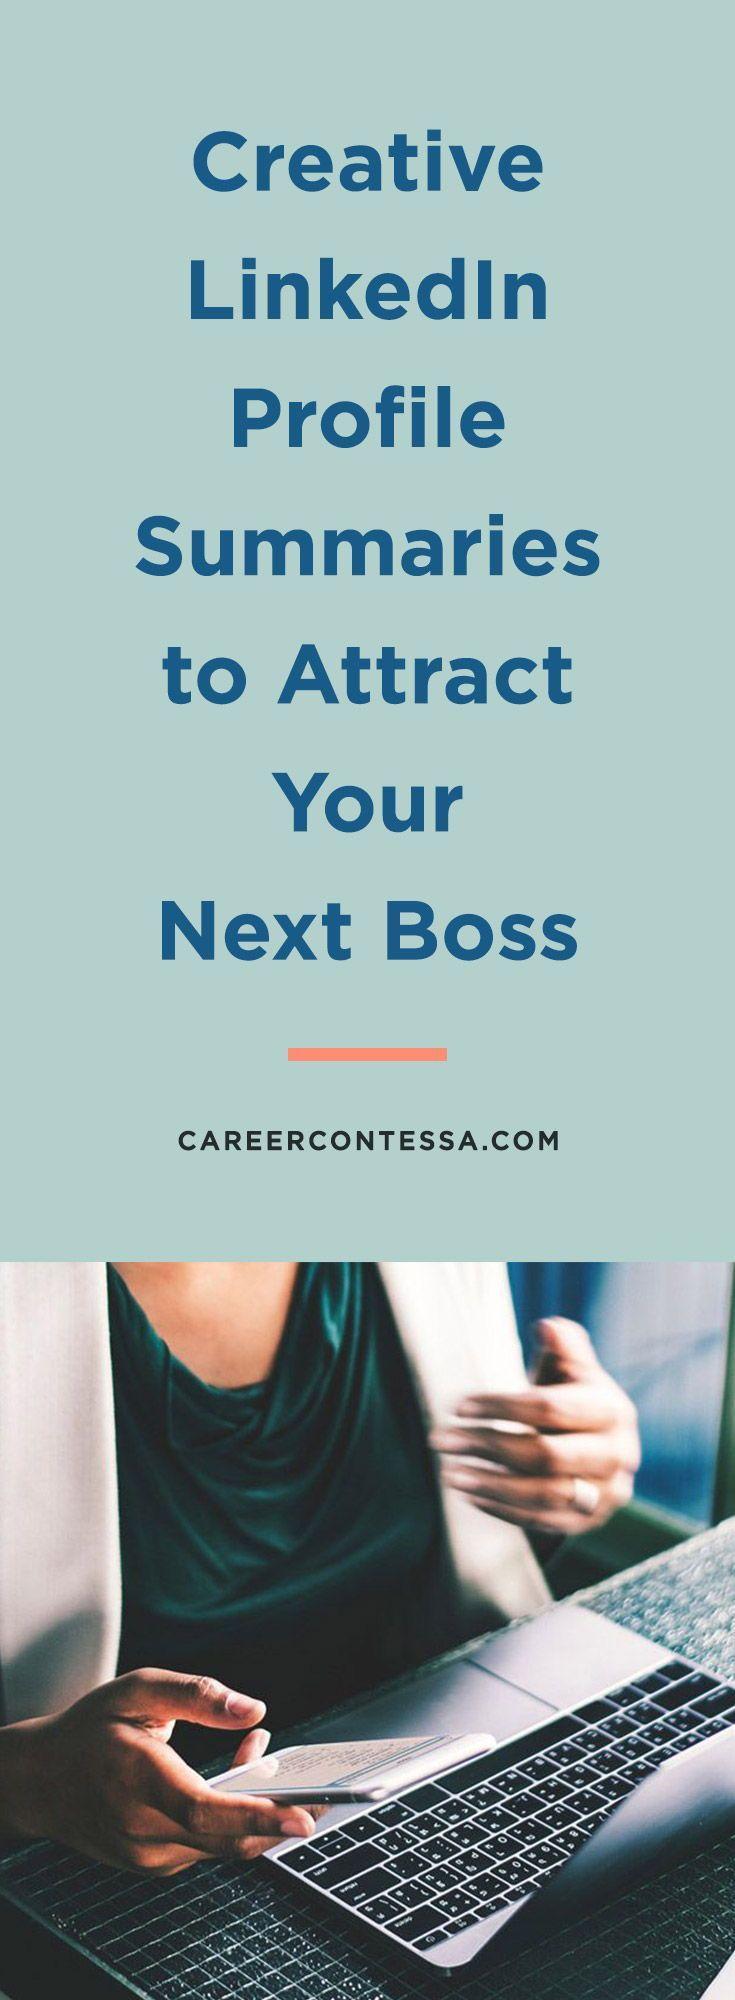 Creative LinkedIn Profile Summaries to Attract Your Next Boss   Career Contessa